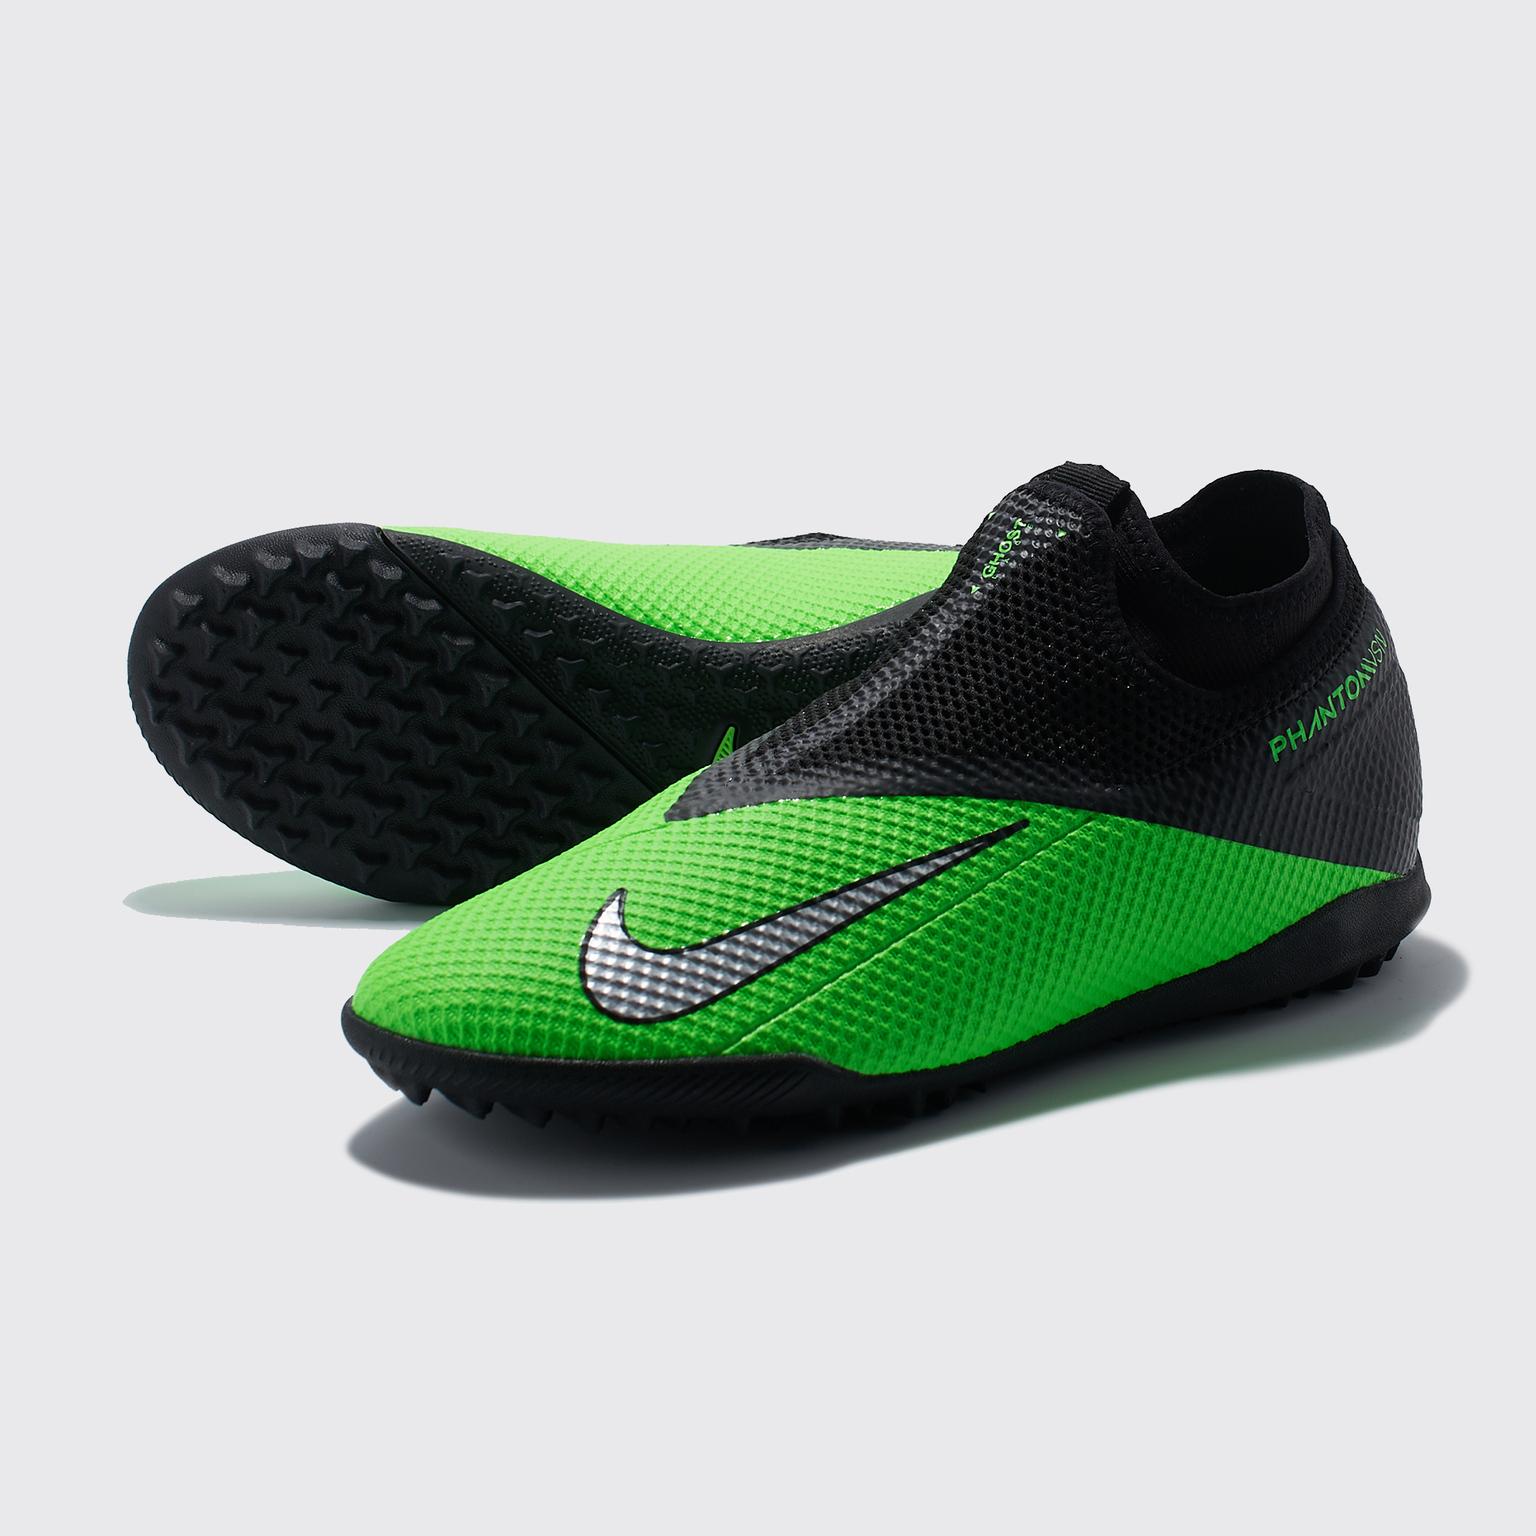 Шиповки Nike Phantom Vision 2 Academy DF TF CD4172-306 шиповки детские nike phantom vision 2 academy df tf cd4078 606